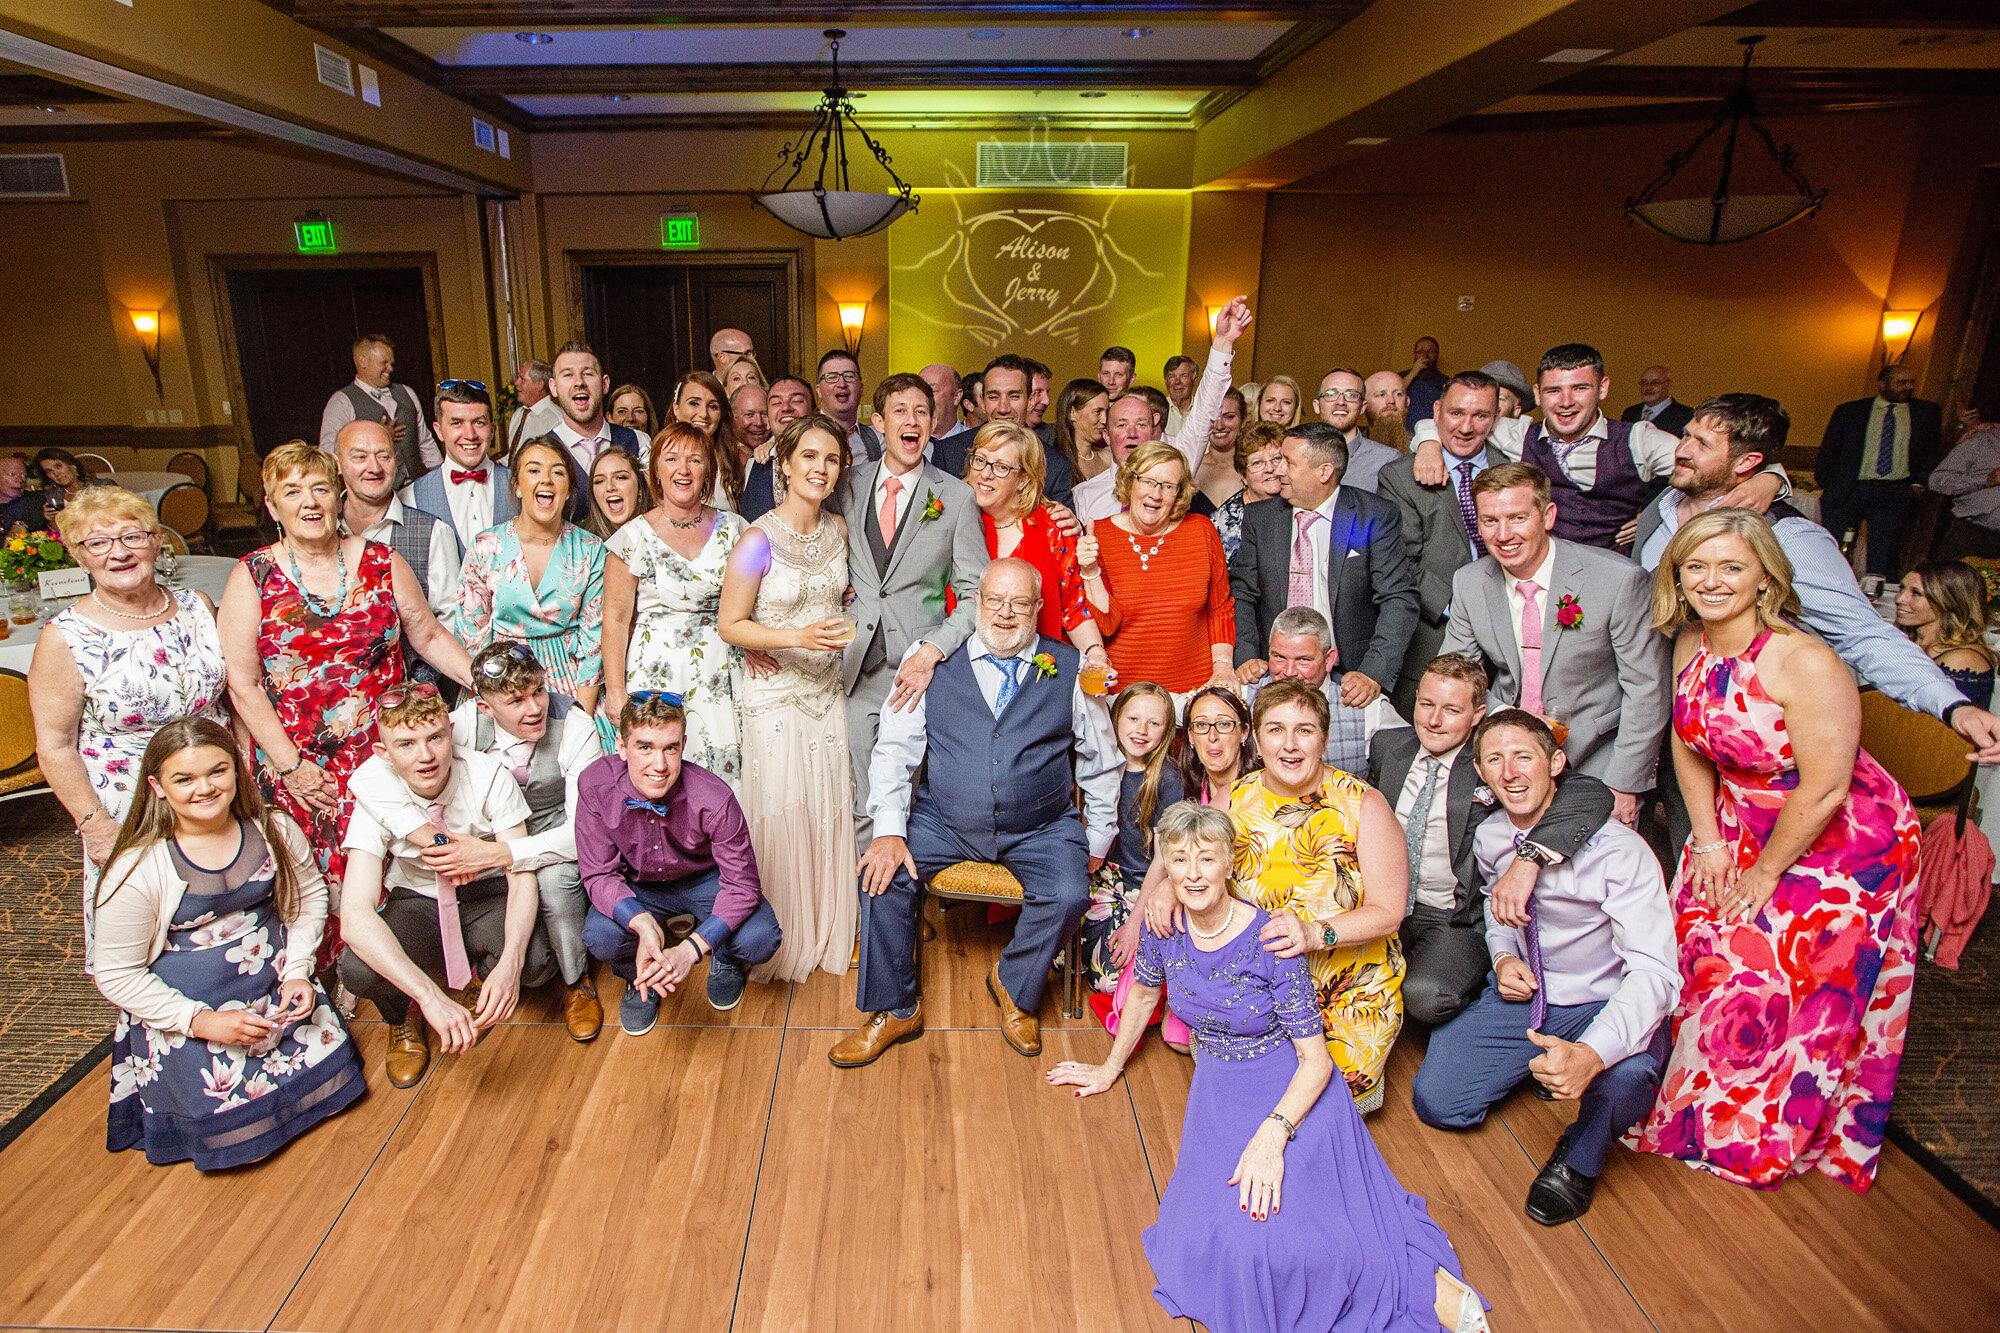 Seriously_Sabrina_Photography_Colorado_Springs_Club_at_Flying_Horse_Destination_Wedding_ODwyer138.jpg